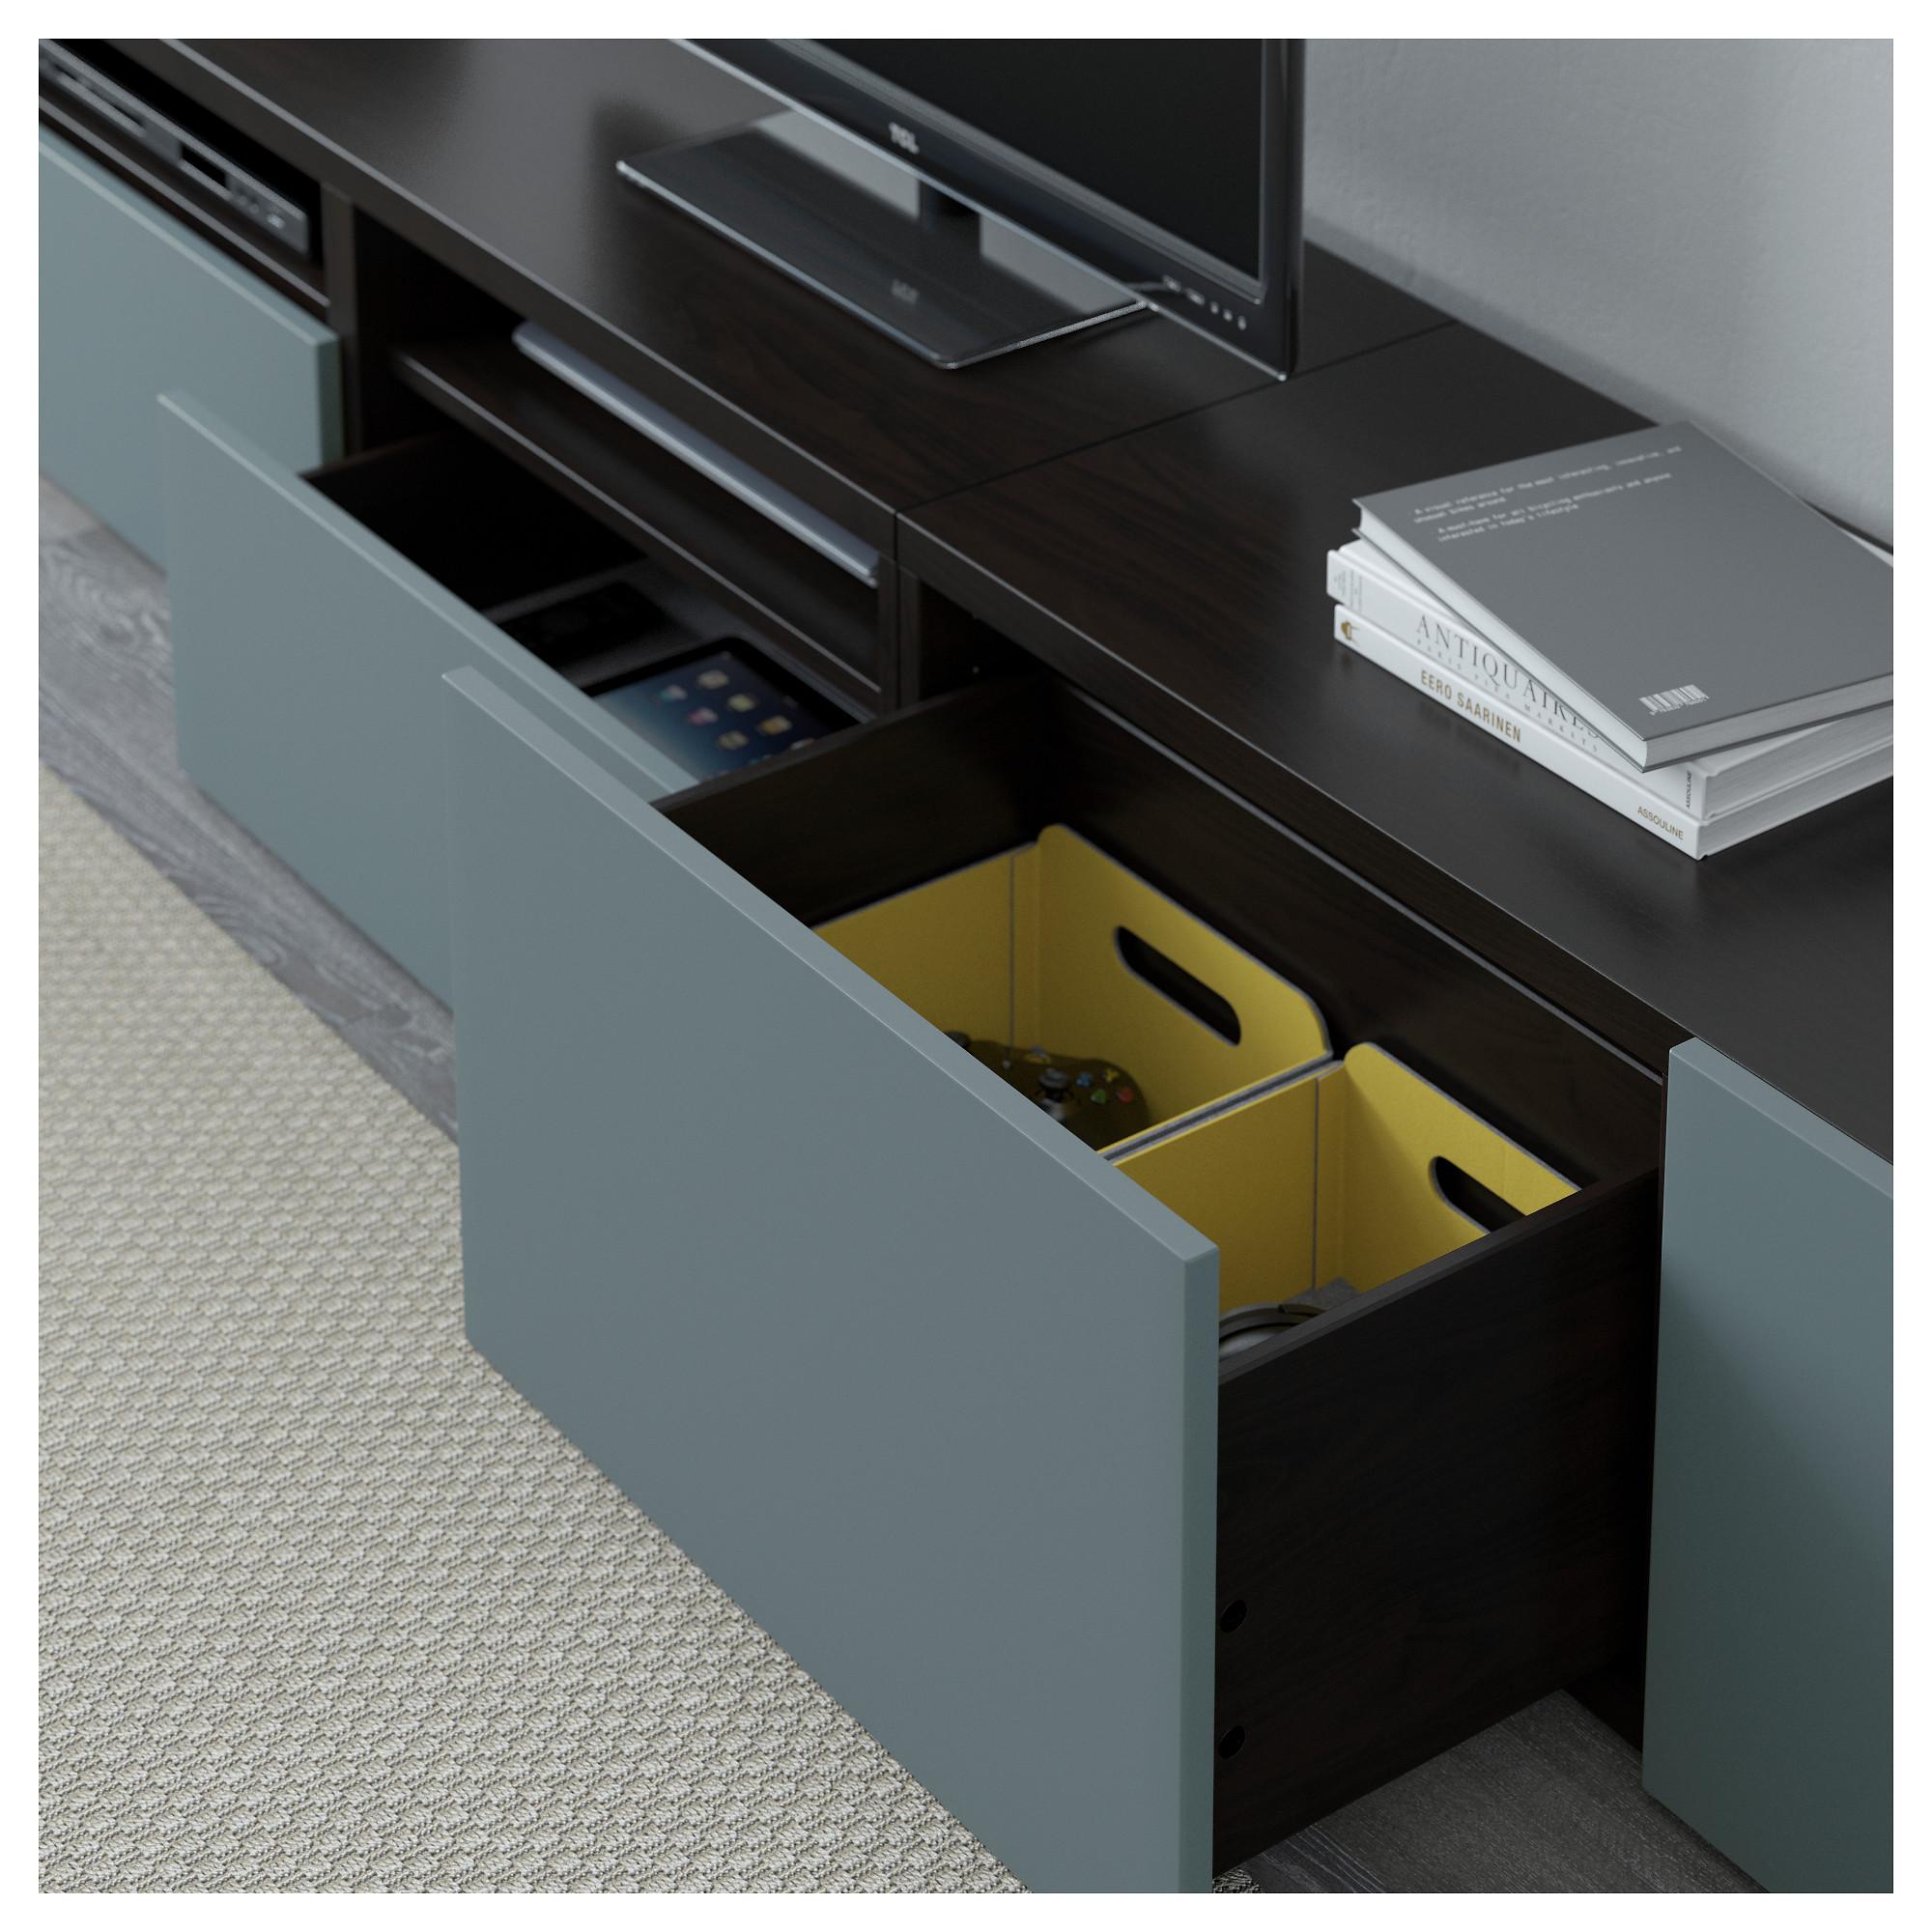 Шкаф для ТВ, комбинация БЕСТО артикуль № 392.516.72 в наличии. Онлайн магазин IKEA Беларусь. Быстрая доставка и монтаж.